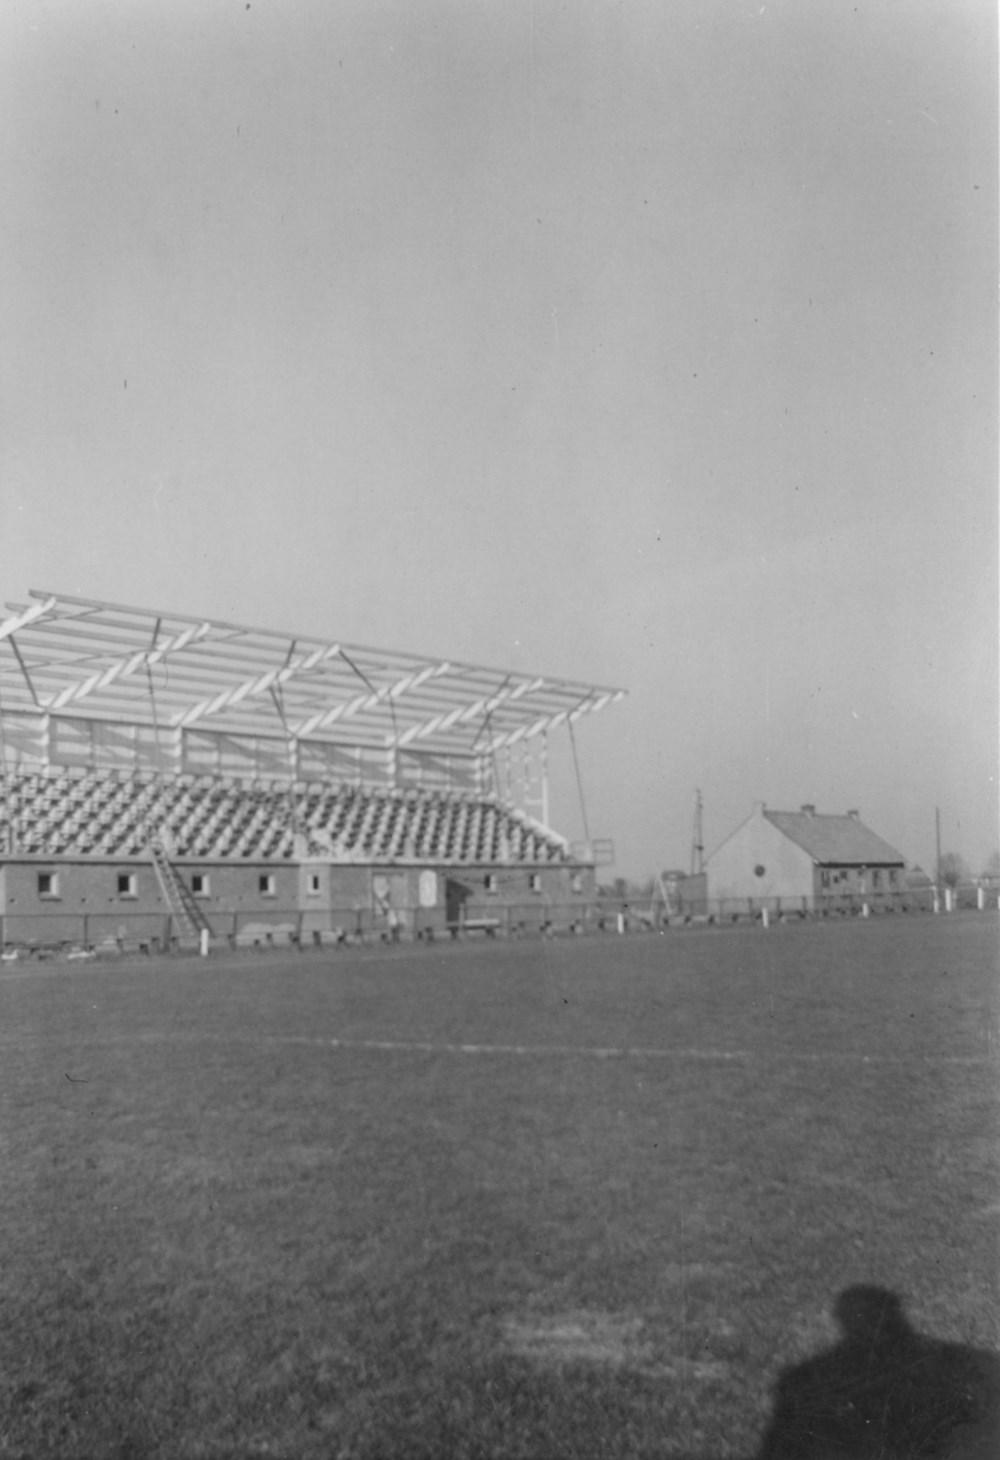 1959 Verenigingsleven Bouw tribune